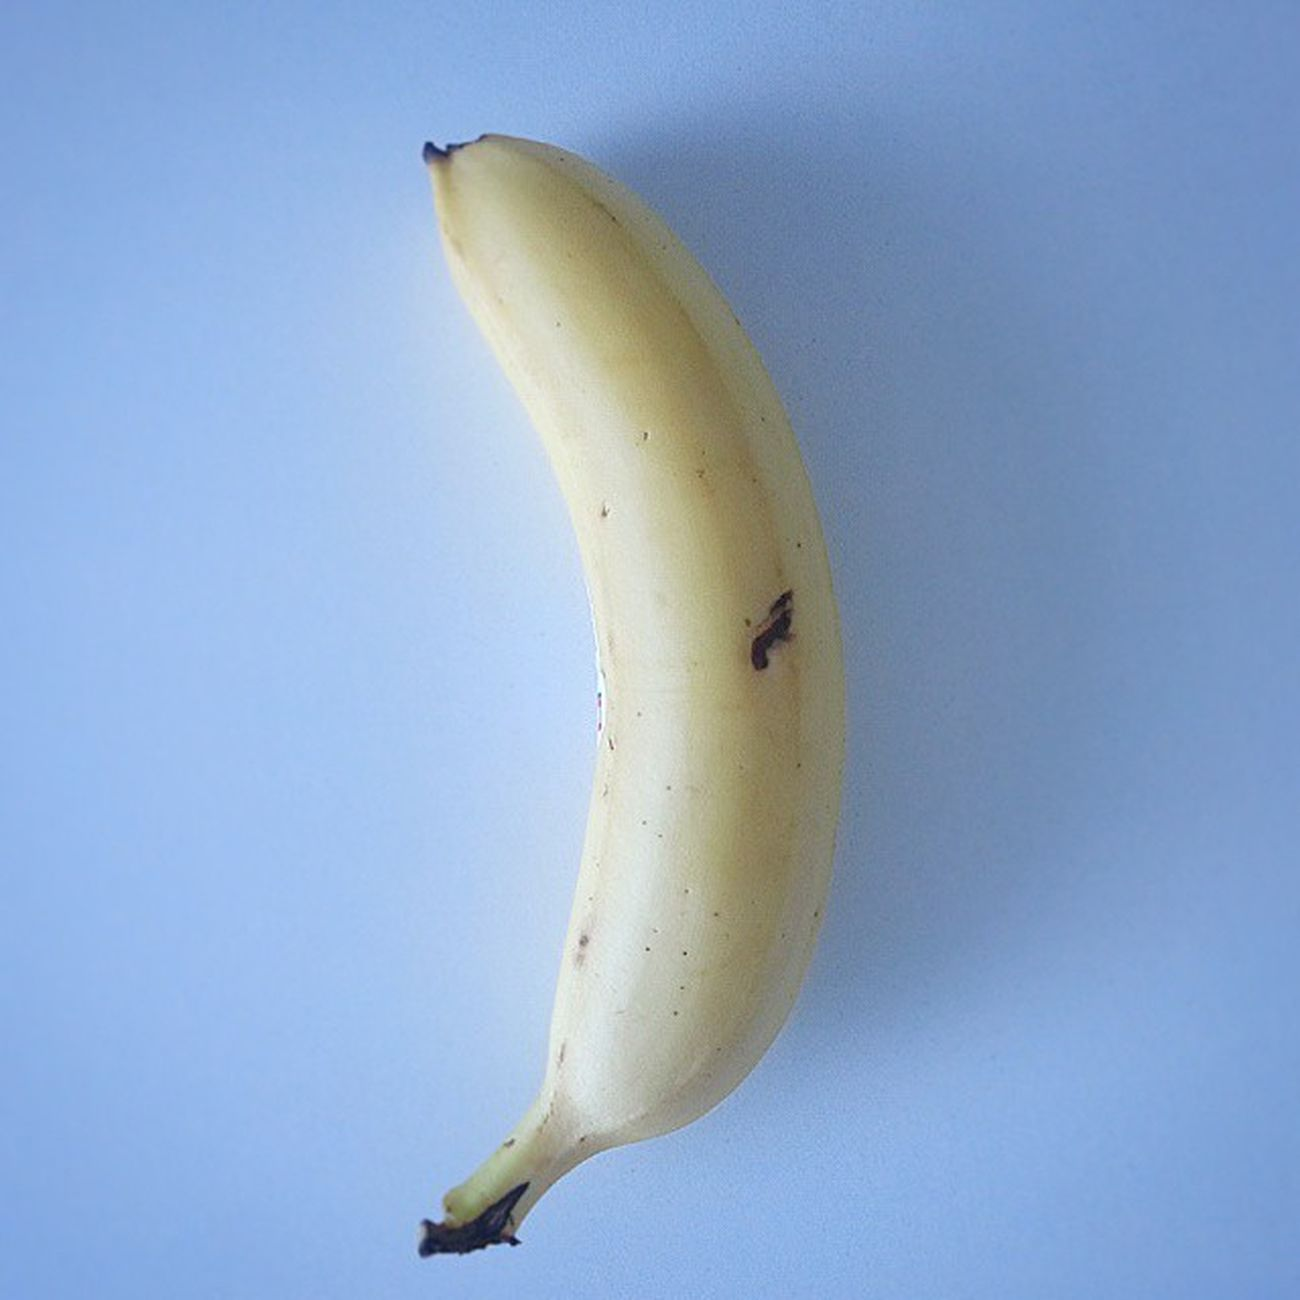 Banana I Nofilter S3only Snack Fruit natural sweet instafruit